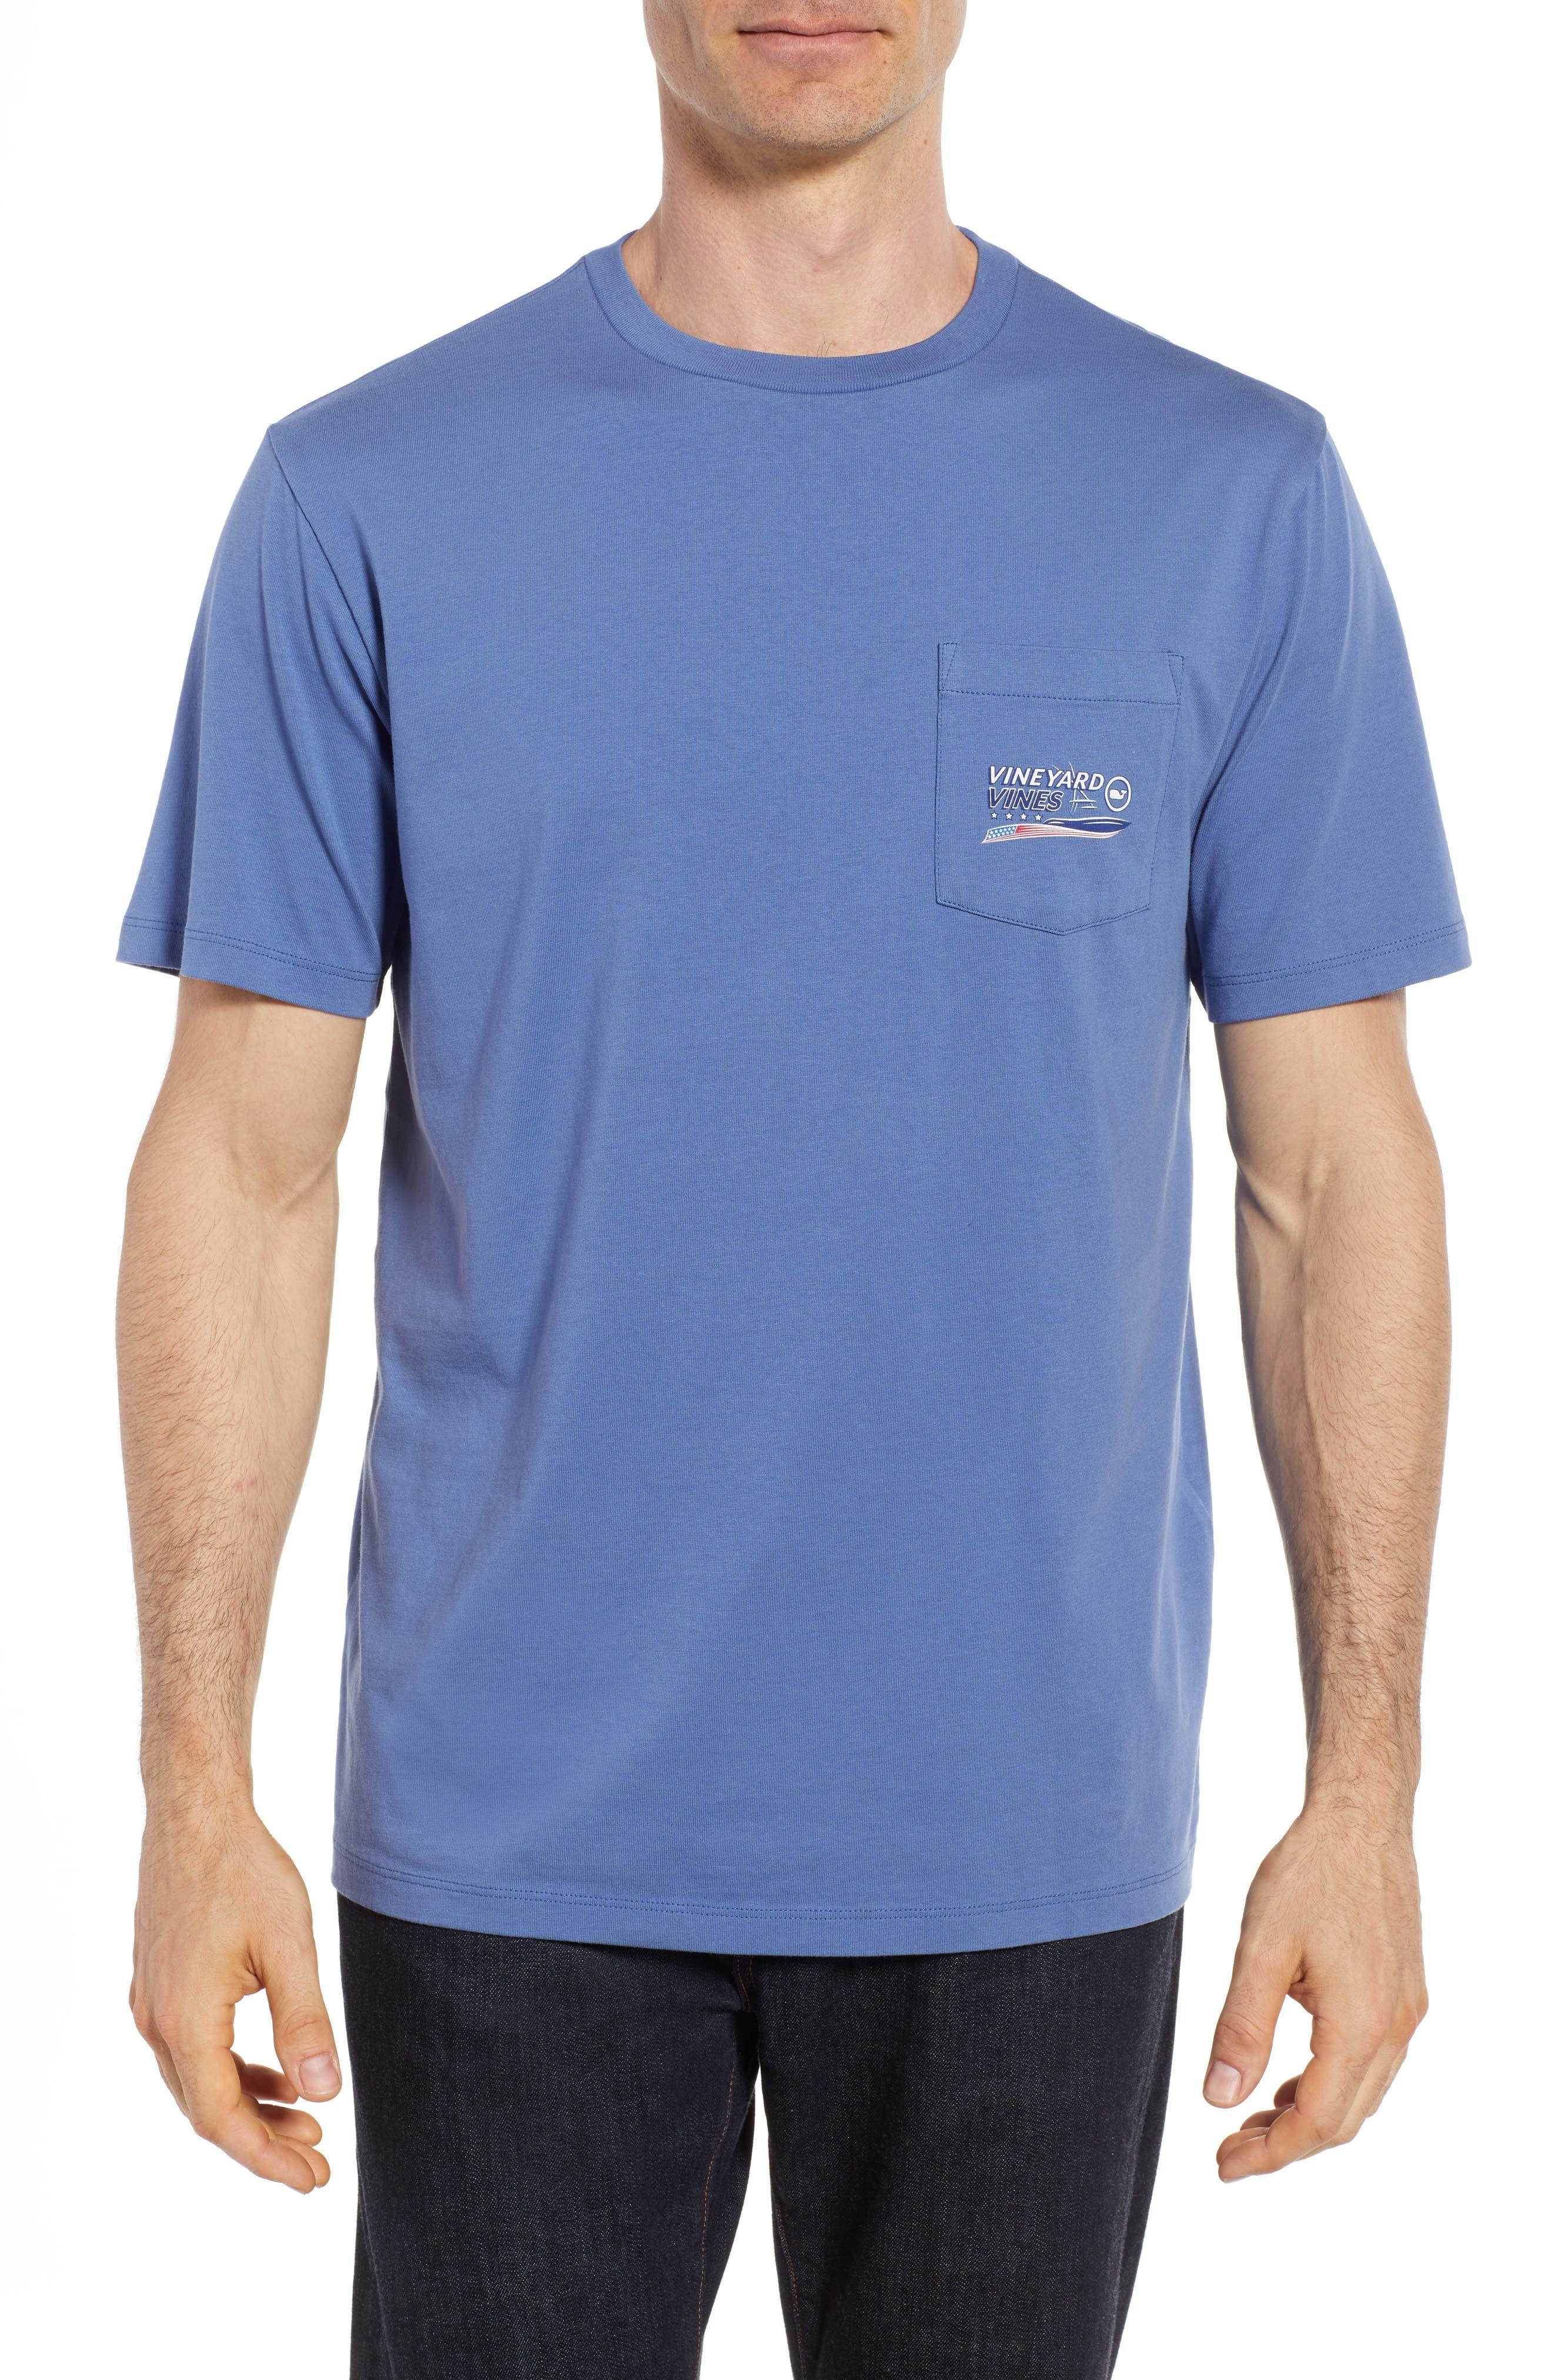 American Sportfisher T-Shirt,                             Main thumbnail 1, color,                             Moonshine